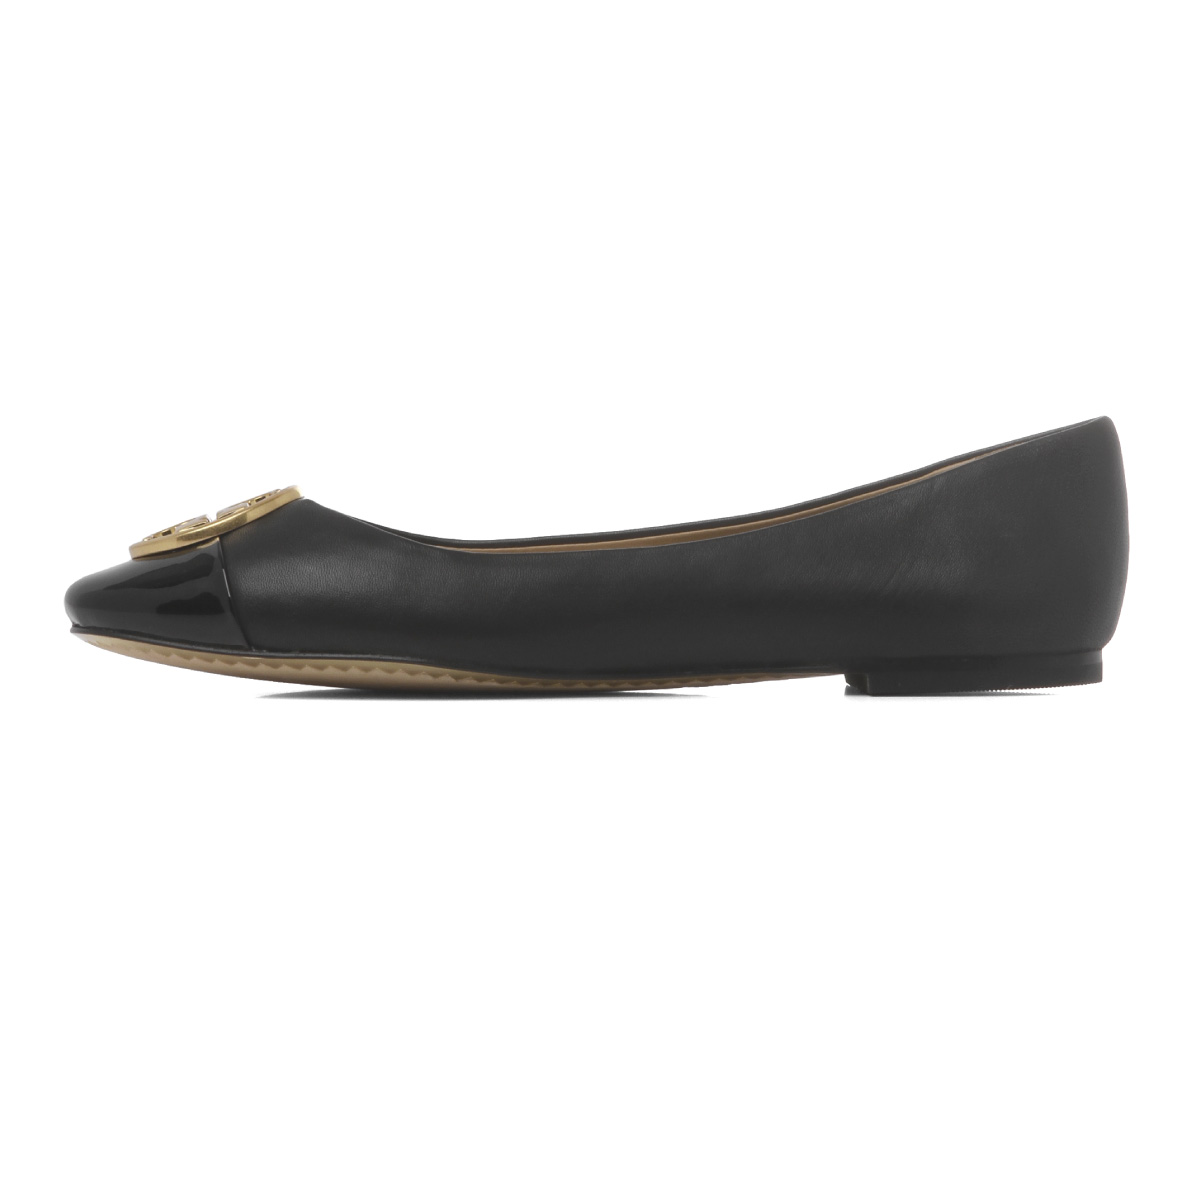 623e7b59869 ... Tolly Birch TORY BURCH shoes Lady's 46882 009 ballet shoes CHELSEA  Chelsea BLACK/BLACK black ...